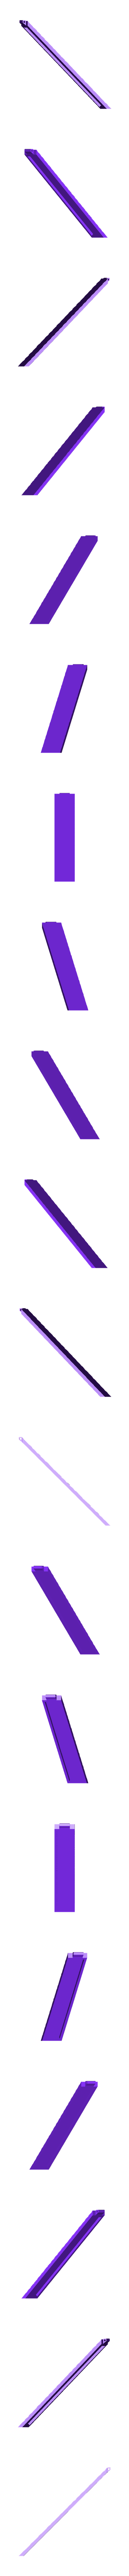 rampes scx24 rampe h100 45 deg crans.STL Download STL file AXIAL SCX24 mini or micro crawler Bridge 100 mm • Object to 3D print, lulu3Dbuilder